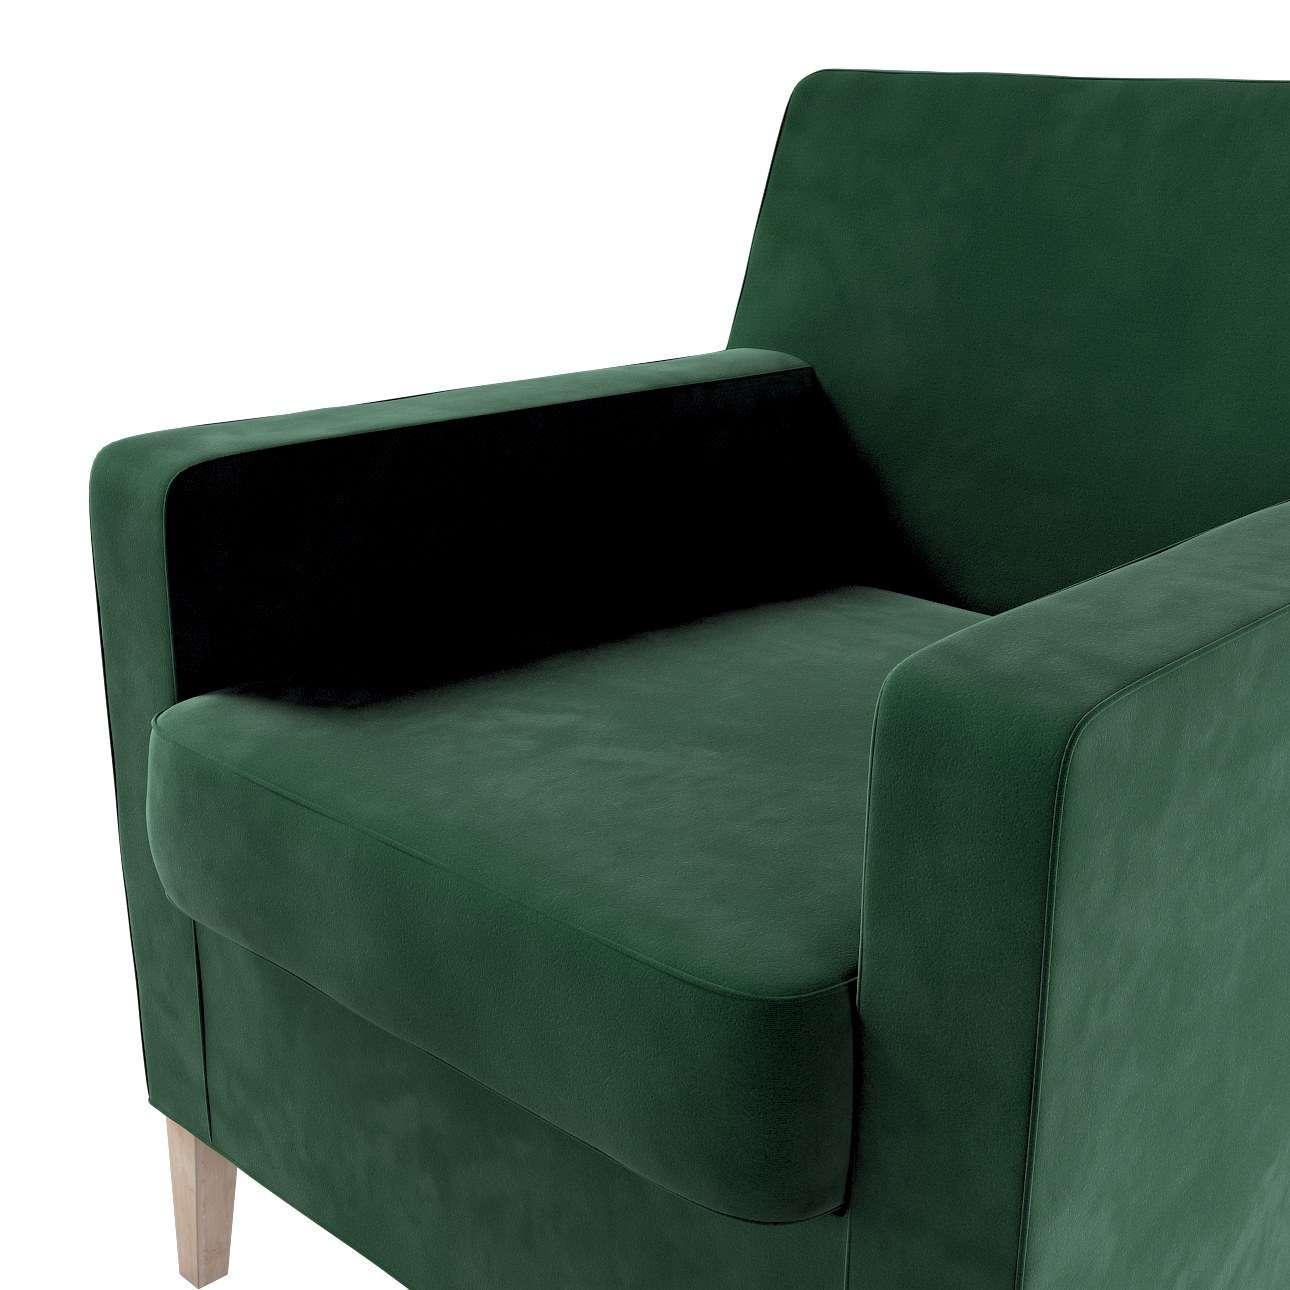 Pokrowiec na fotel Karlstad w kolekcji Velvet, tkanina: 704-13